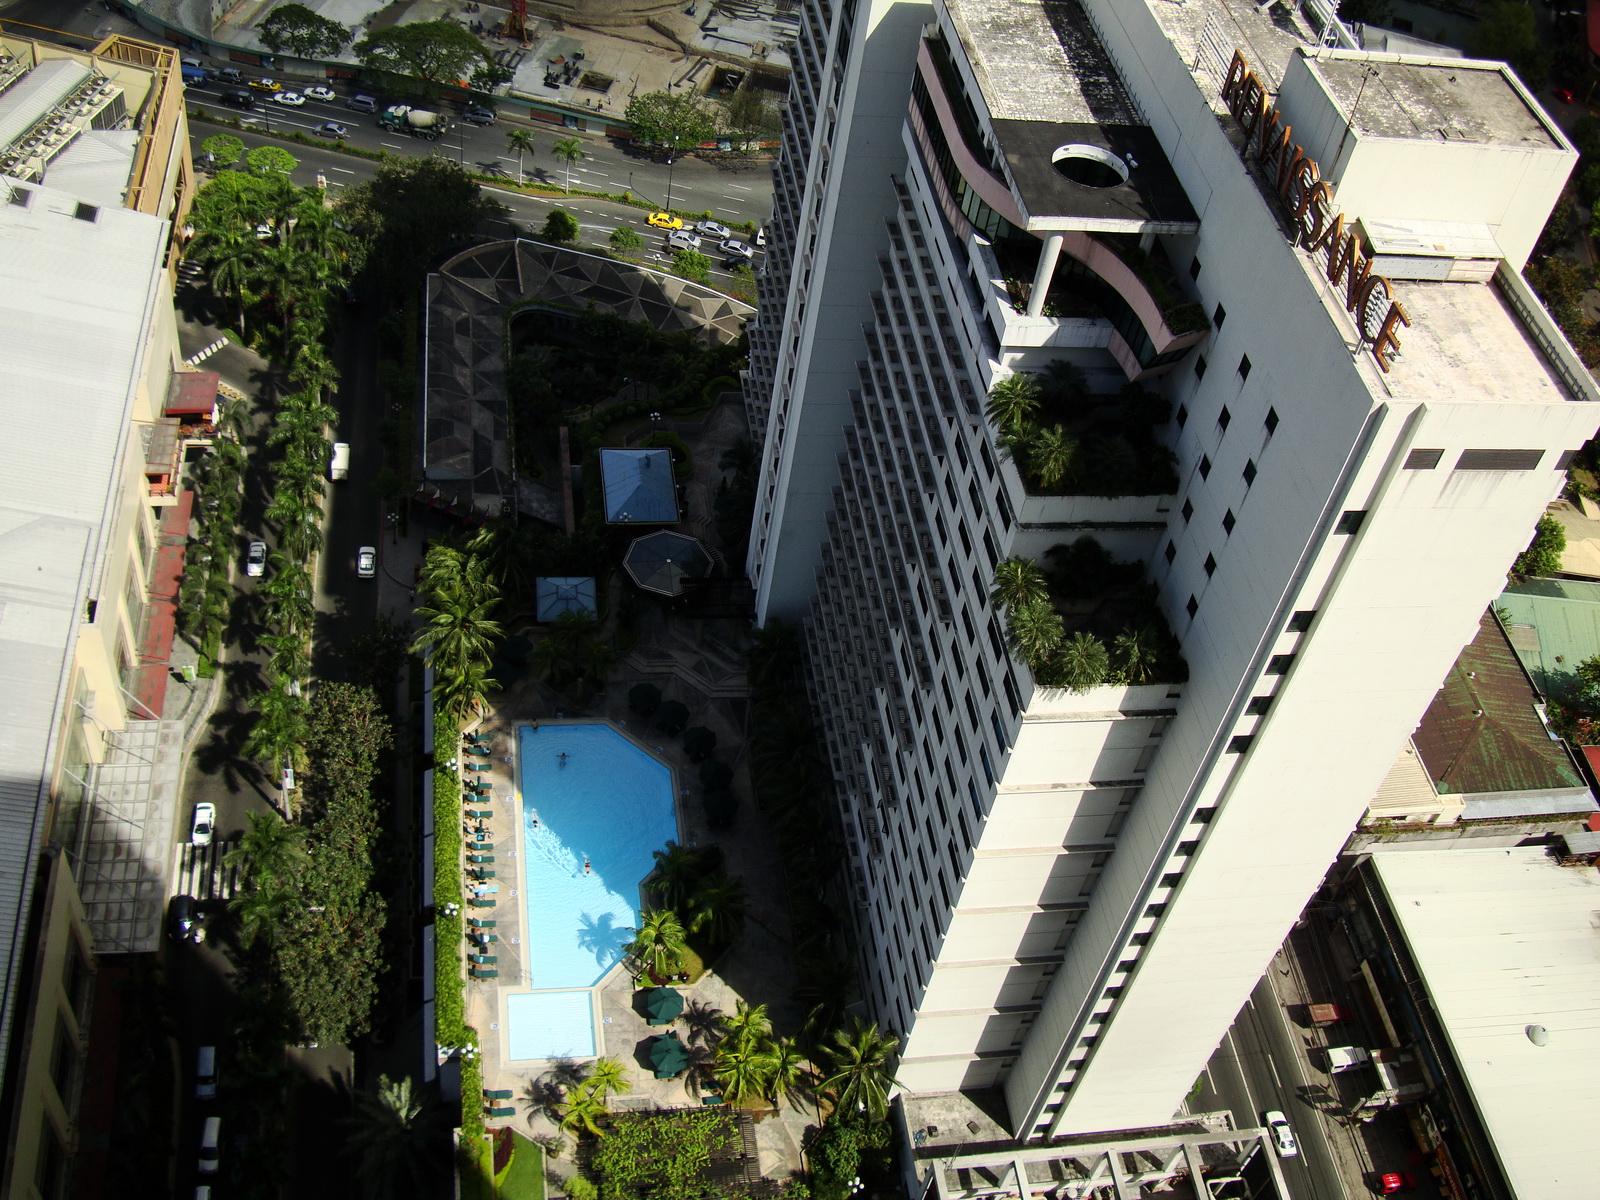 Philippines Manila Makati Renaissance Hotel Swimming Pool Feb 2009 01